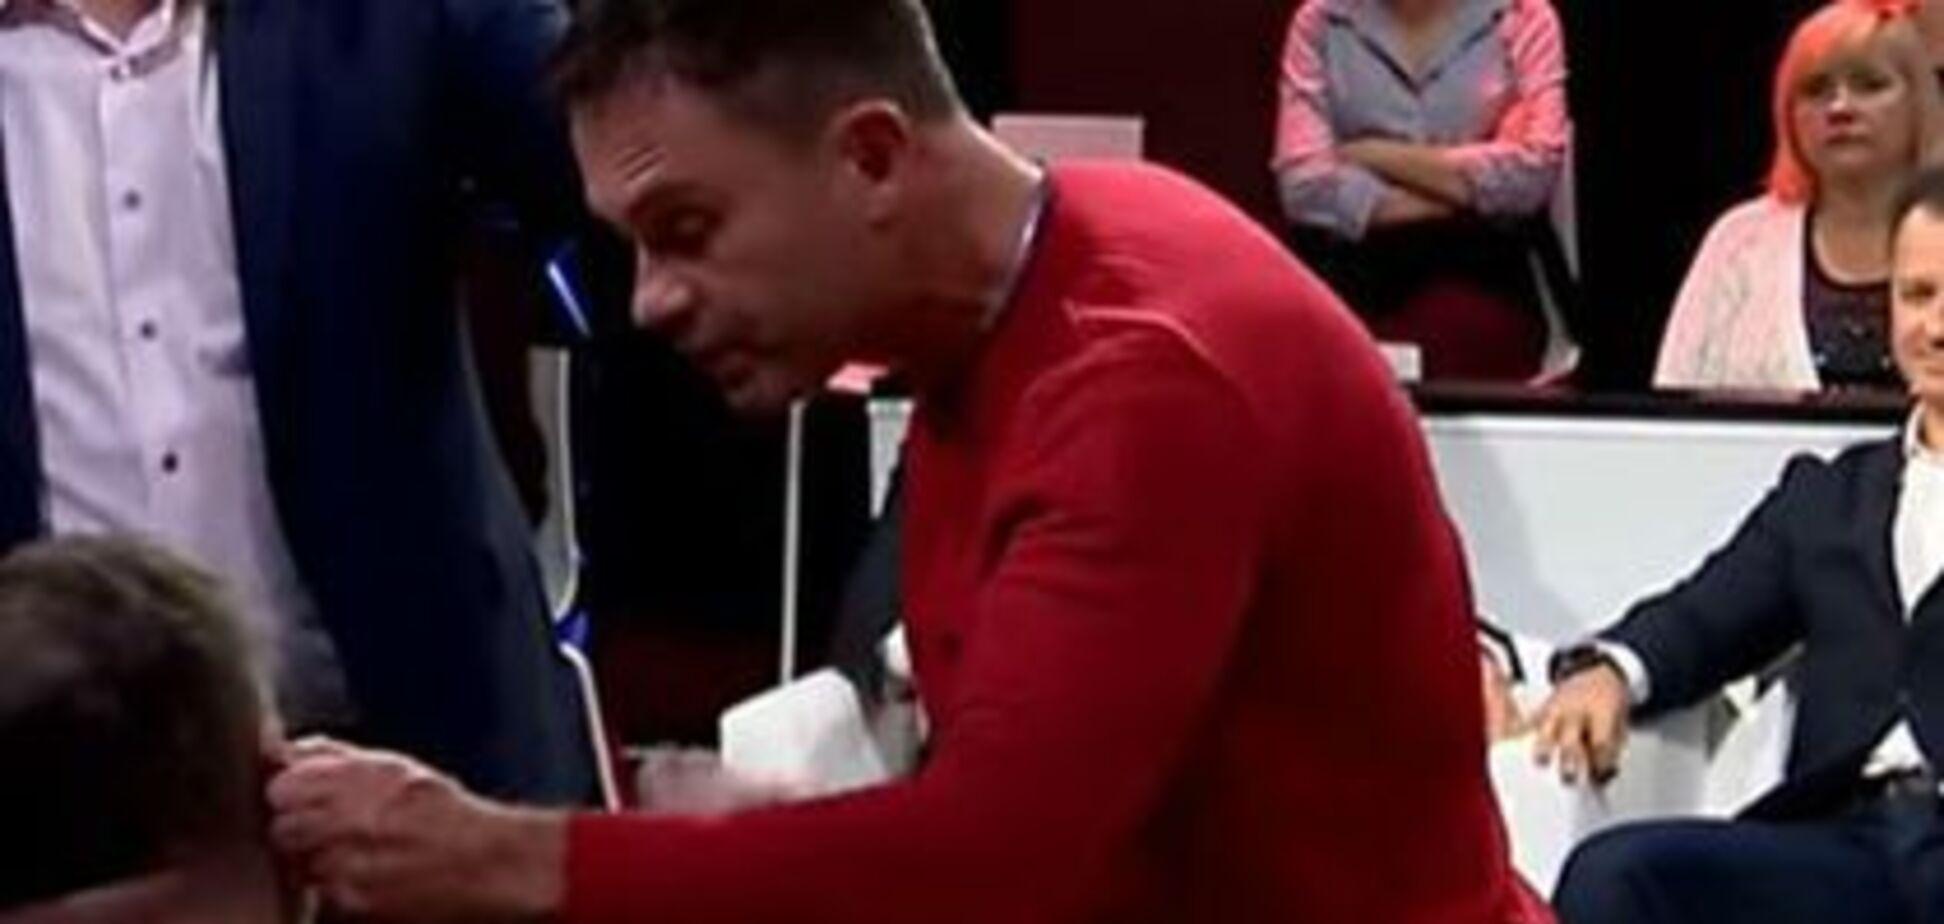 Пропагандиста Коцабу 'наказали' на львовском телевидении